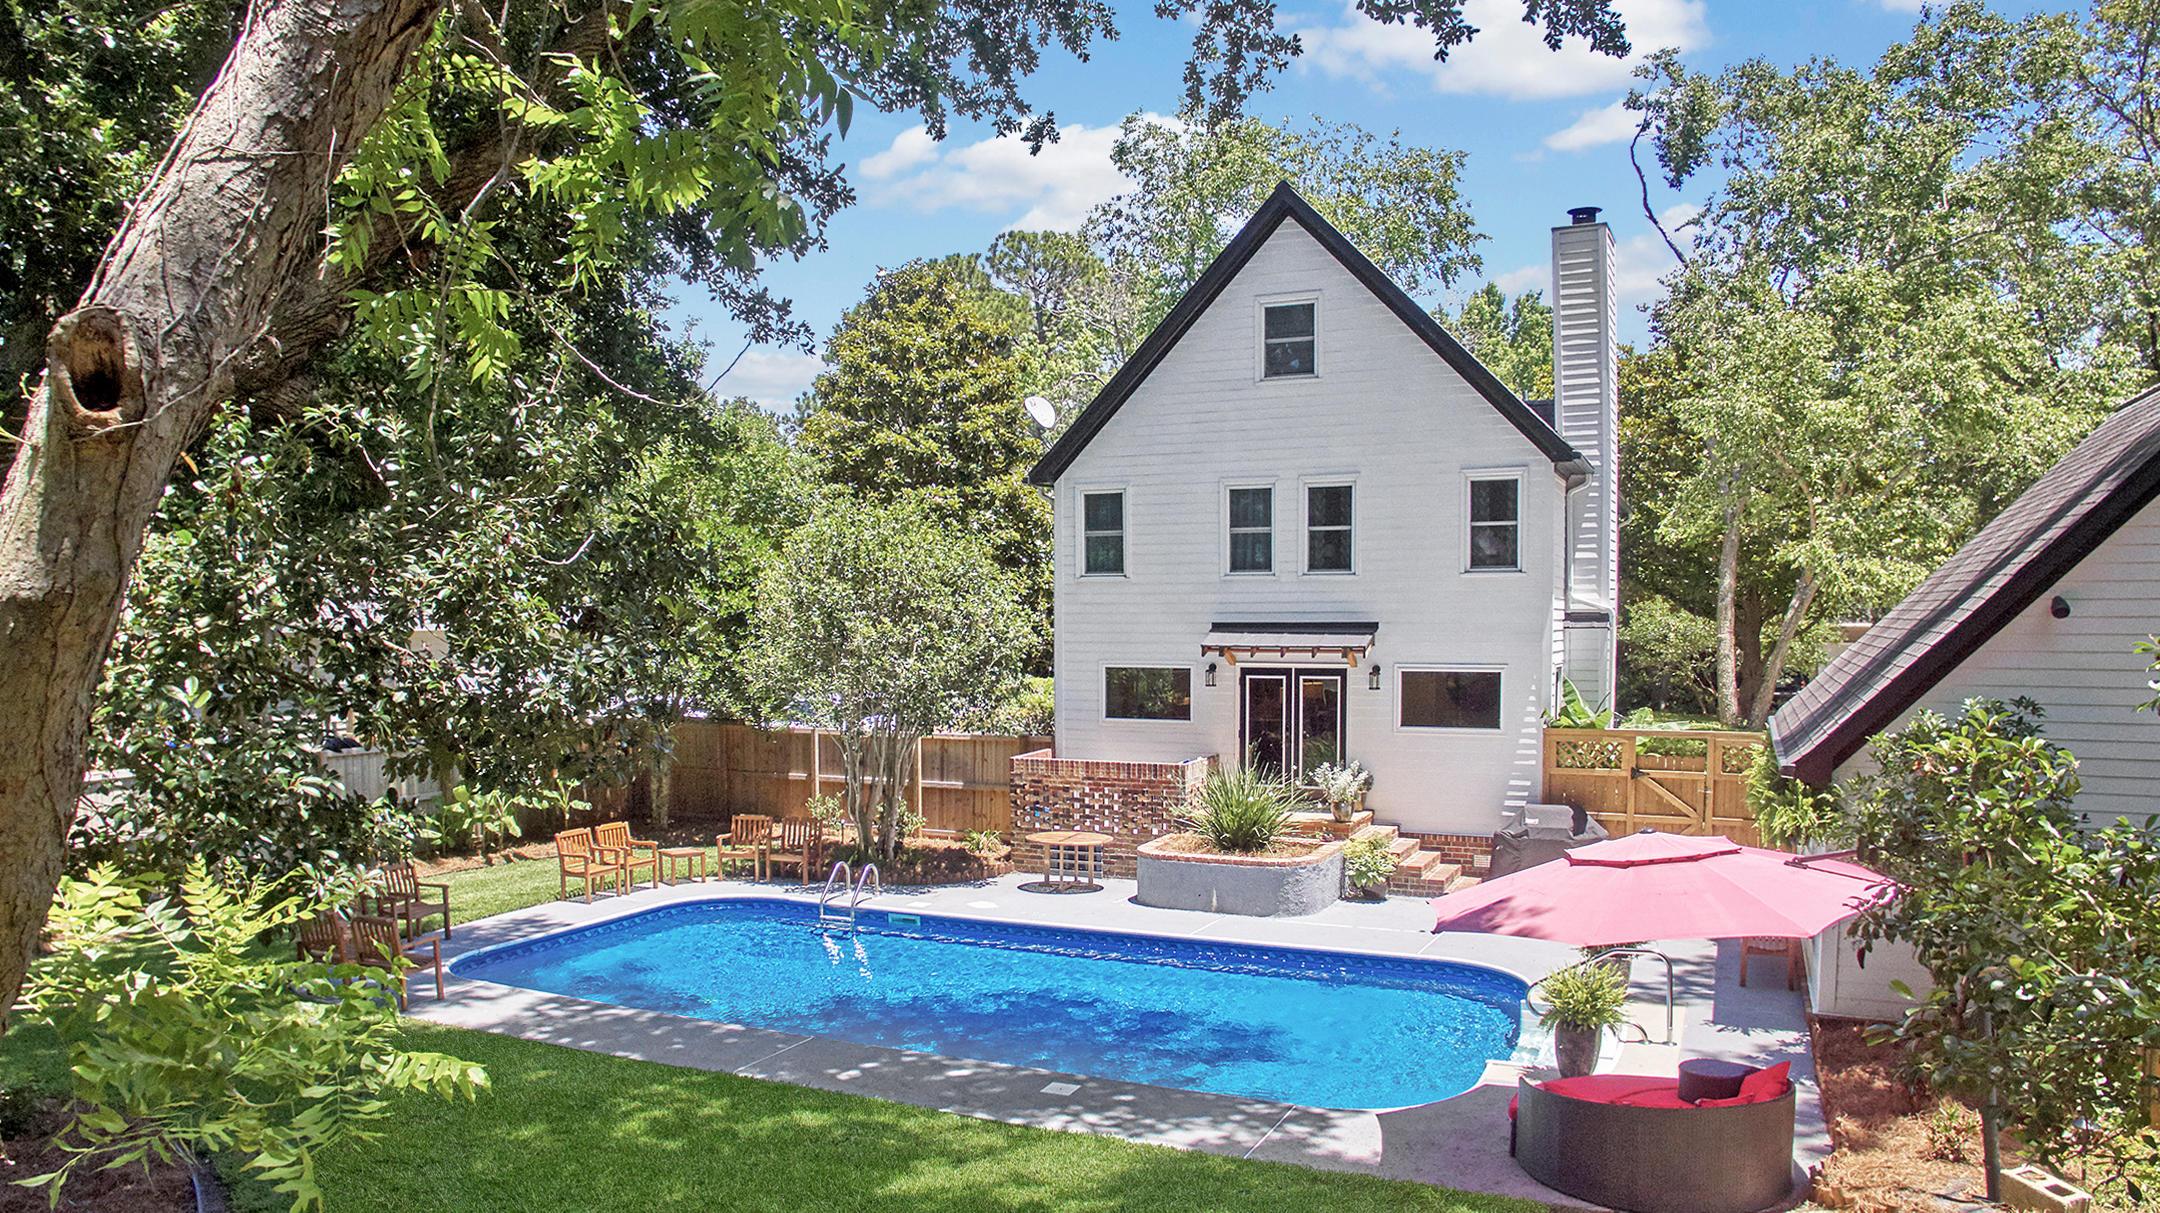 Stiles Point Plantation Homes For Sale - 699 Castle Pinckney, Charleston, SC - 14